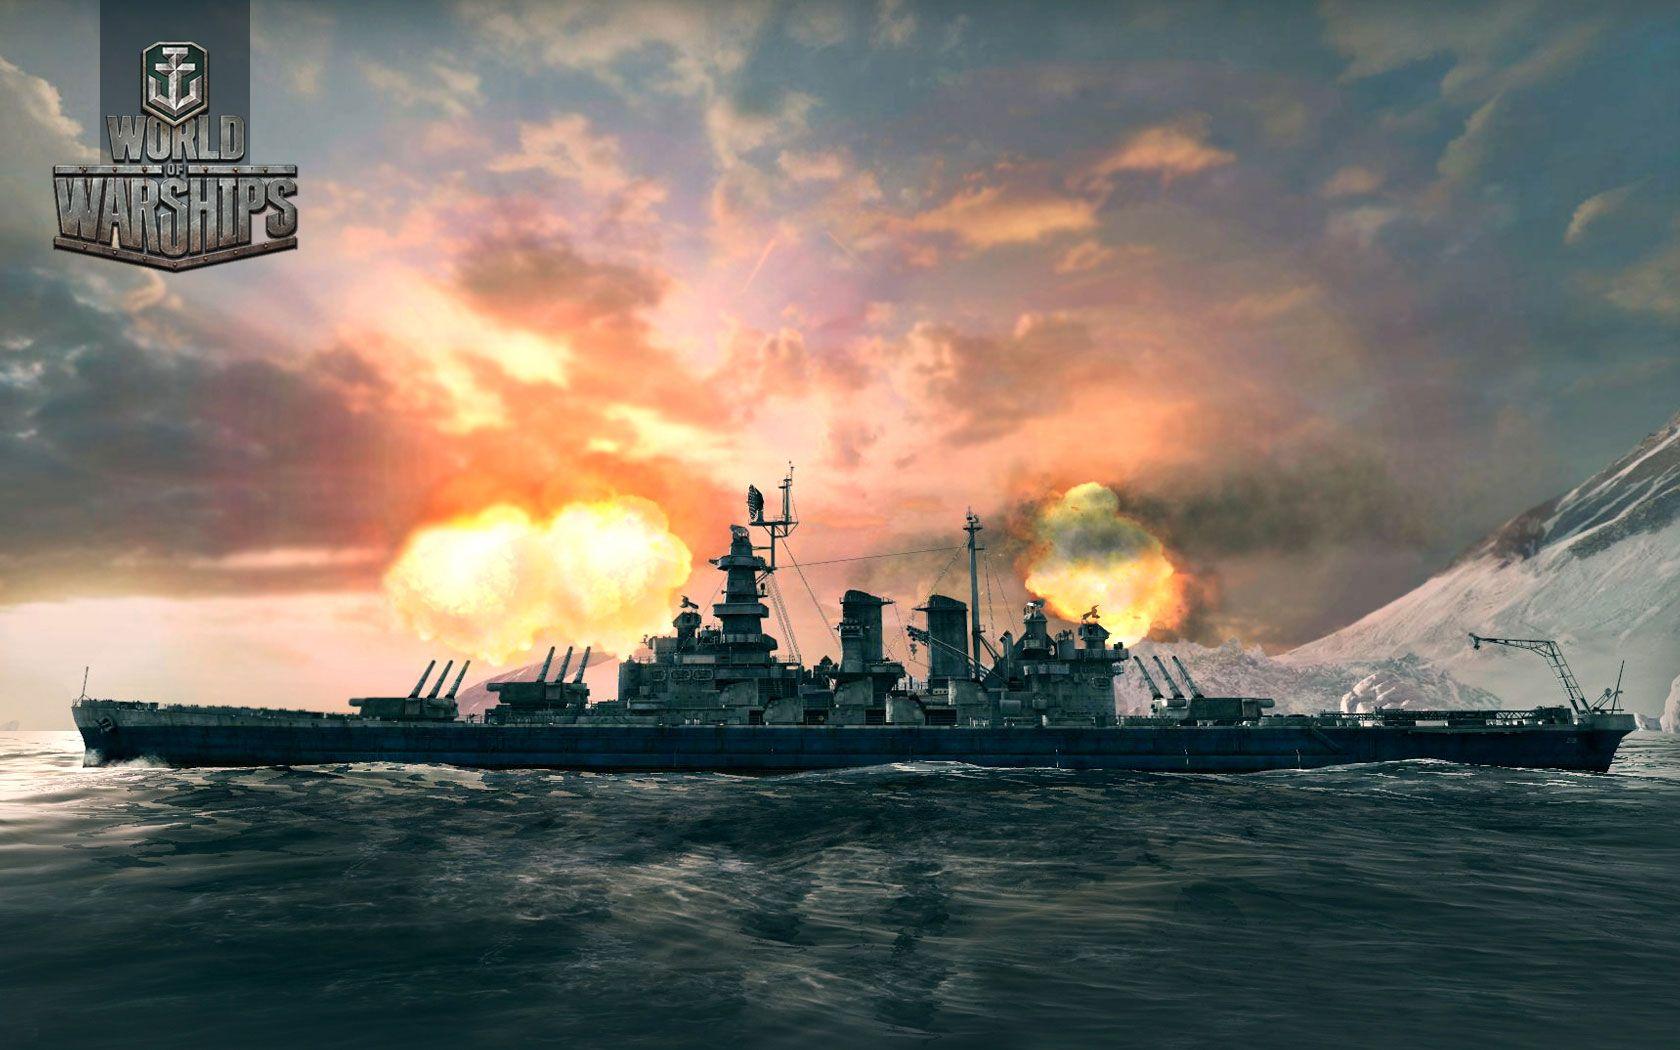 World Of Warships プレイヤーにプレミアムアカウント14日分を進呈